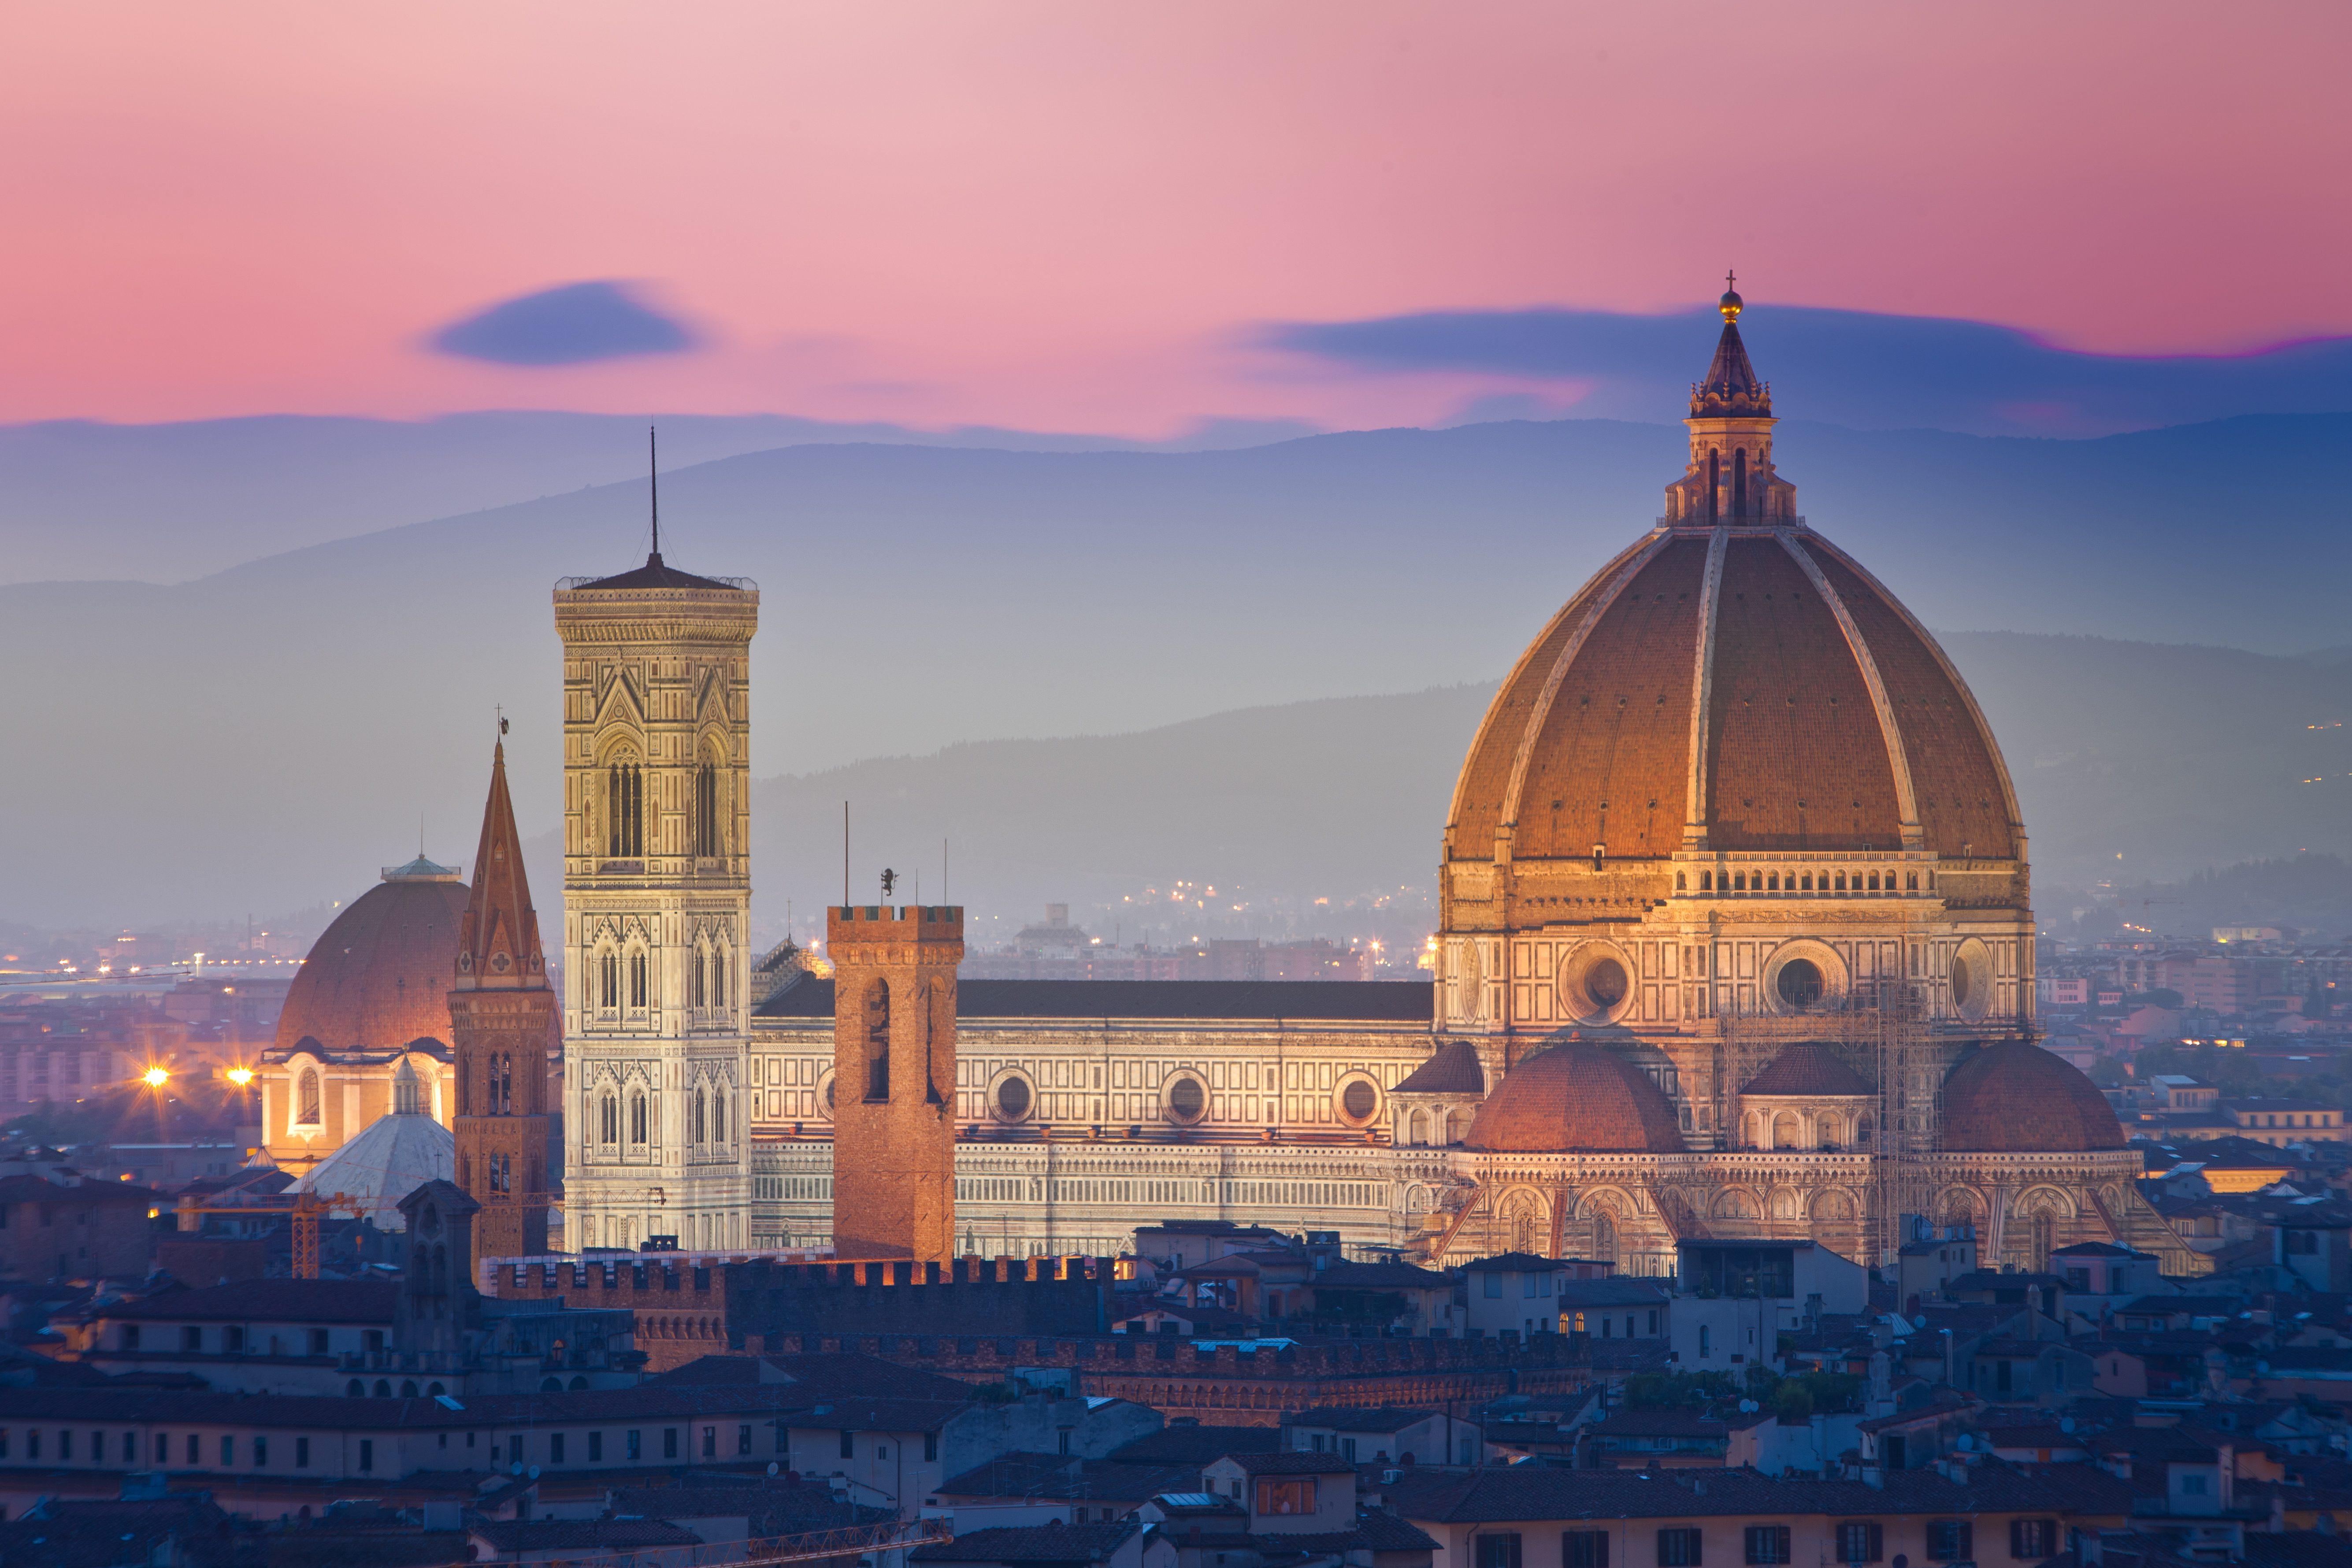 Firenze diventa Capitale della mixology: al via la Florence Cocktail Week